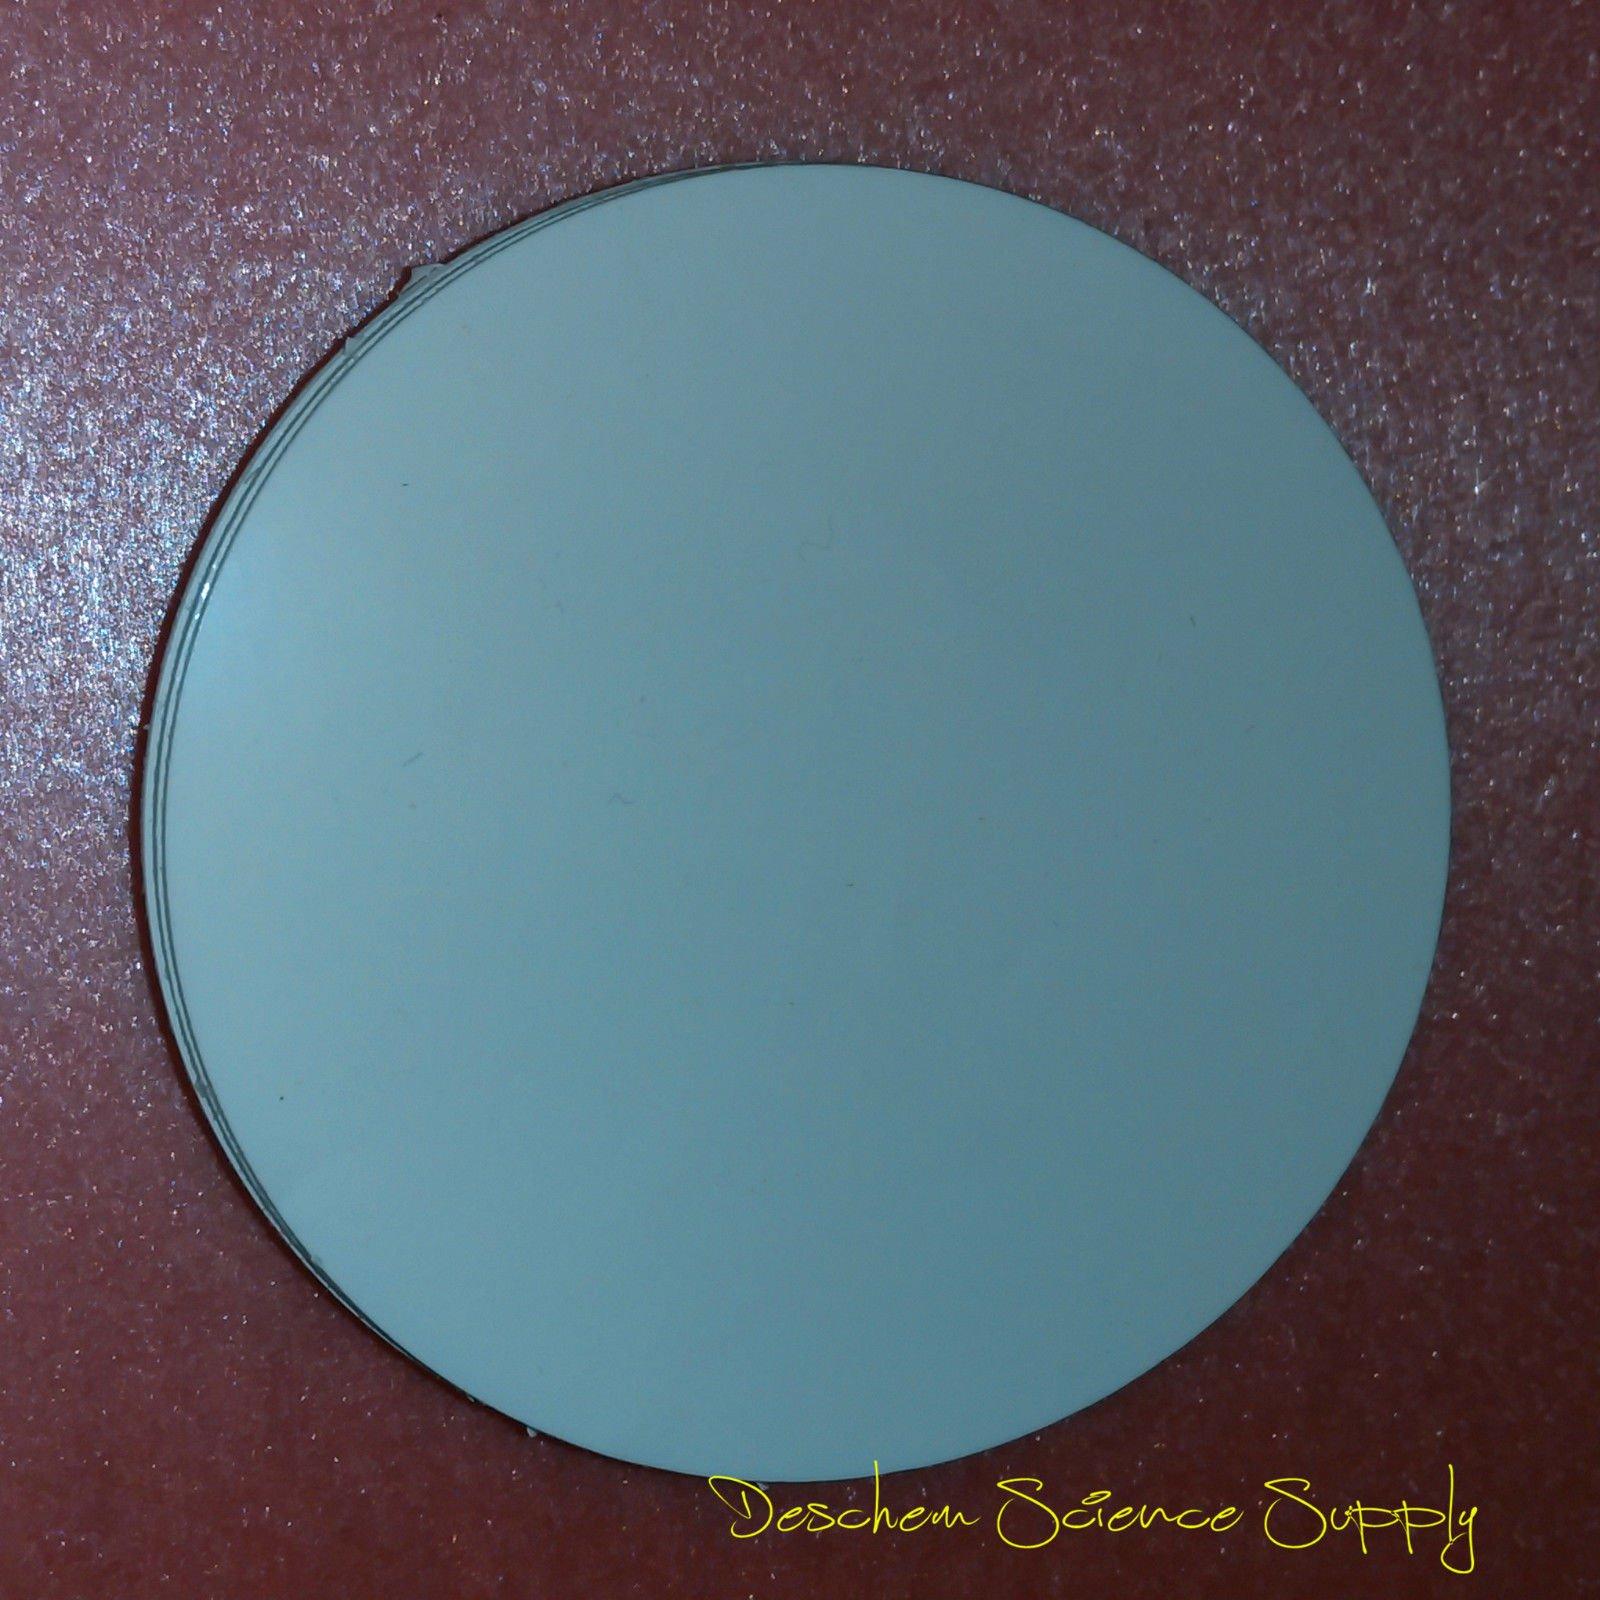 Deschem 110mm,0.45 Micron,Lab Cellulose Acetate Membrane Filter,OD=11CM,50Pcs/Pack by Deschem